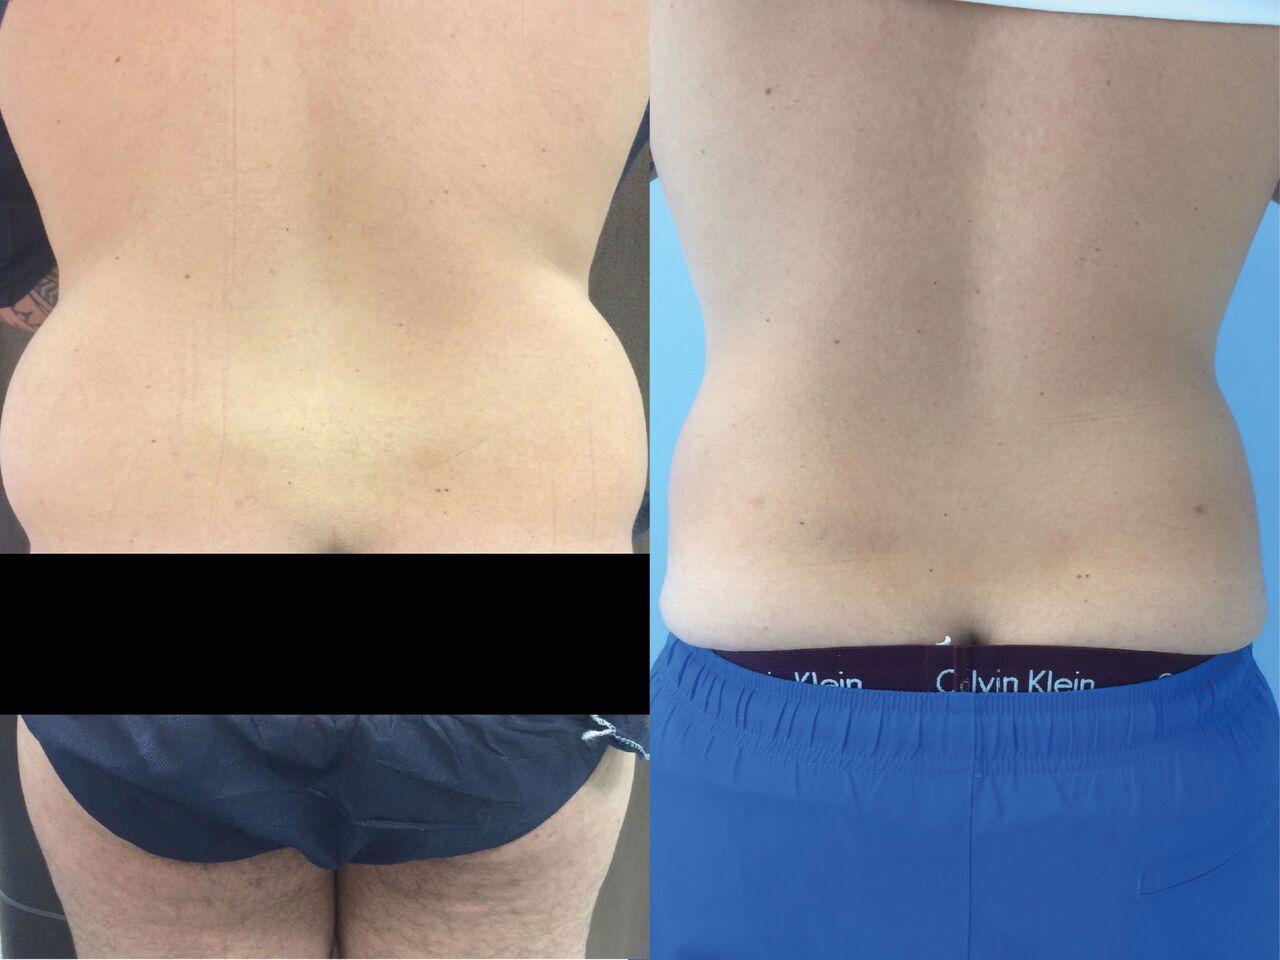 Liposuccion Hanches Homme Chirurgie Esthetique-Lipoaspiration Nyon